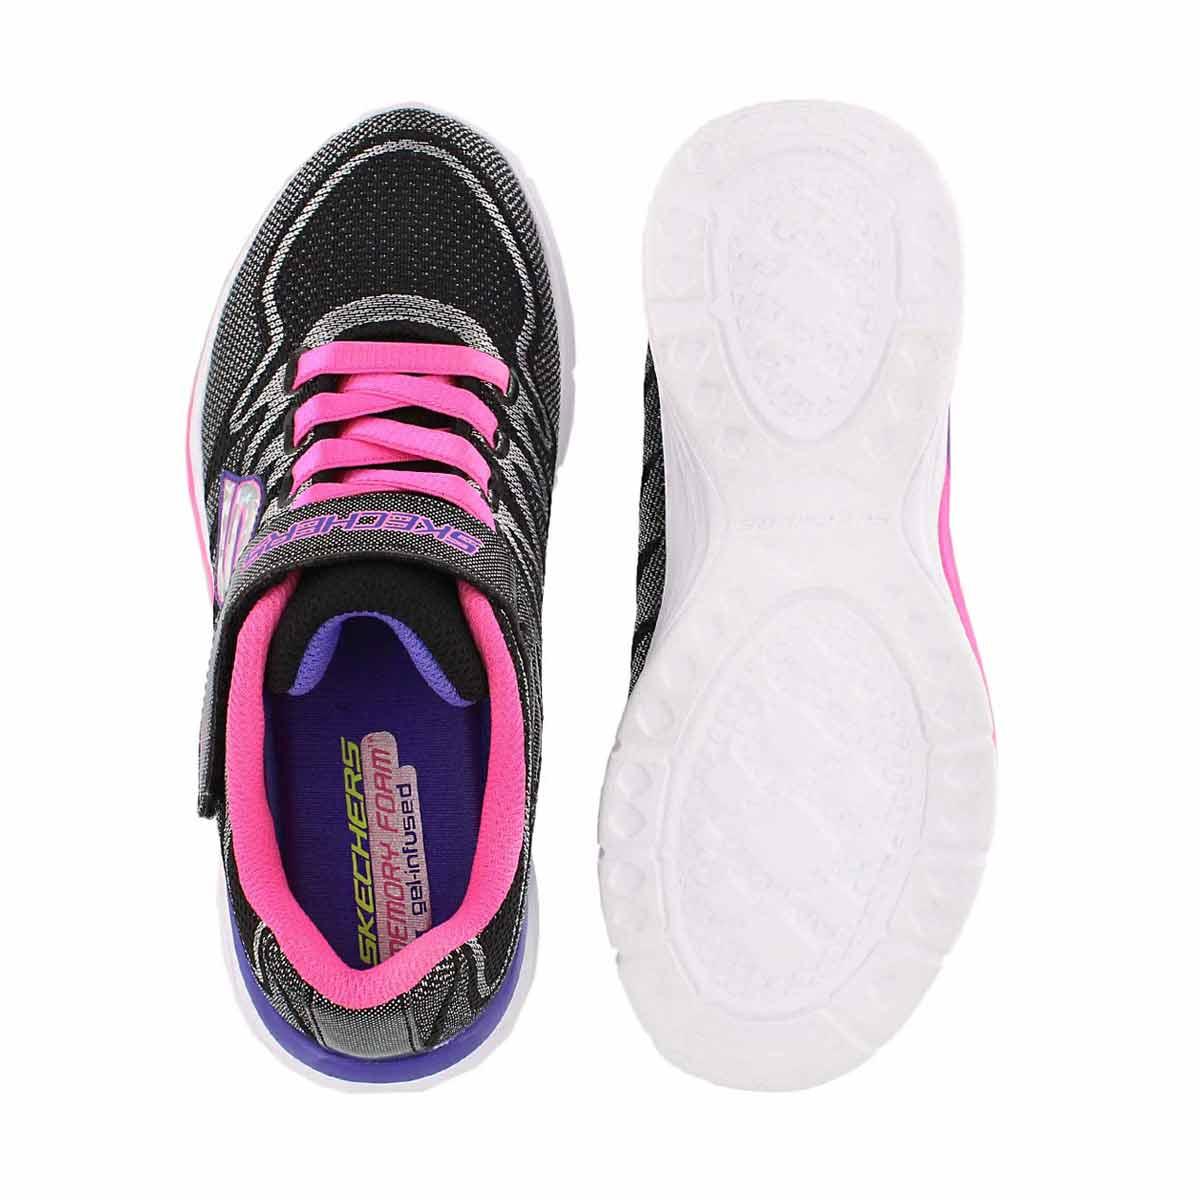 Grls Dream N' Dash blk/pnk sneaker